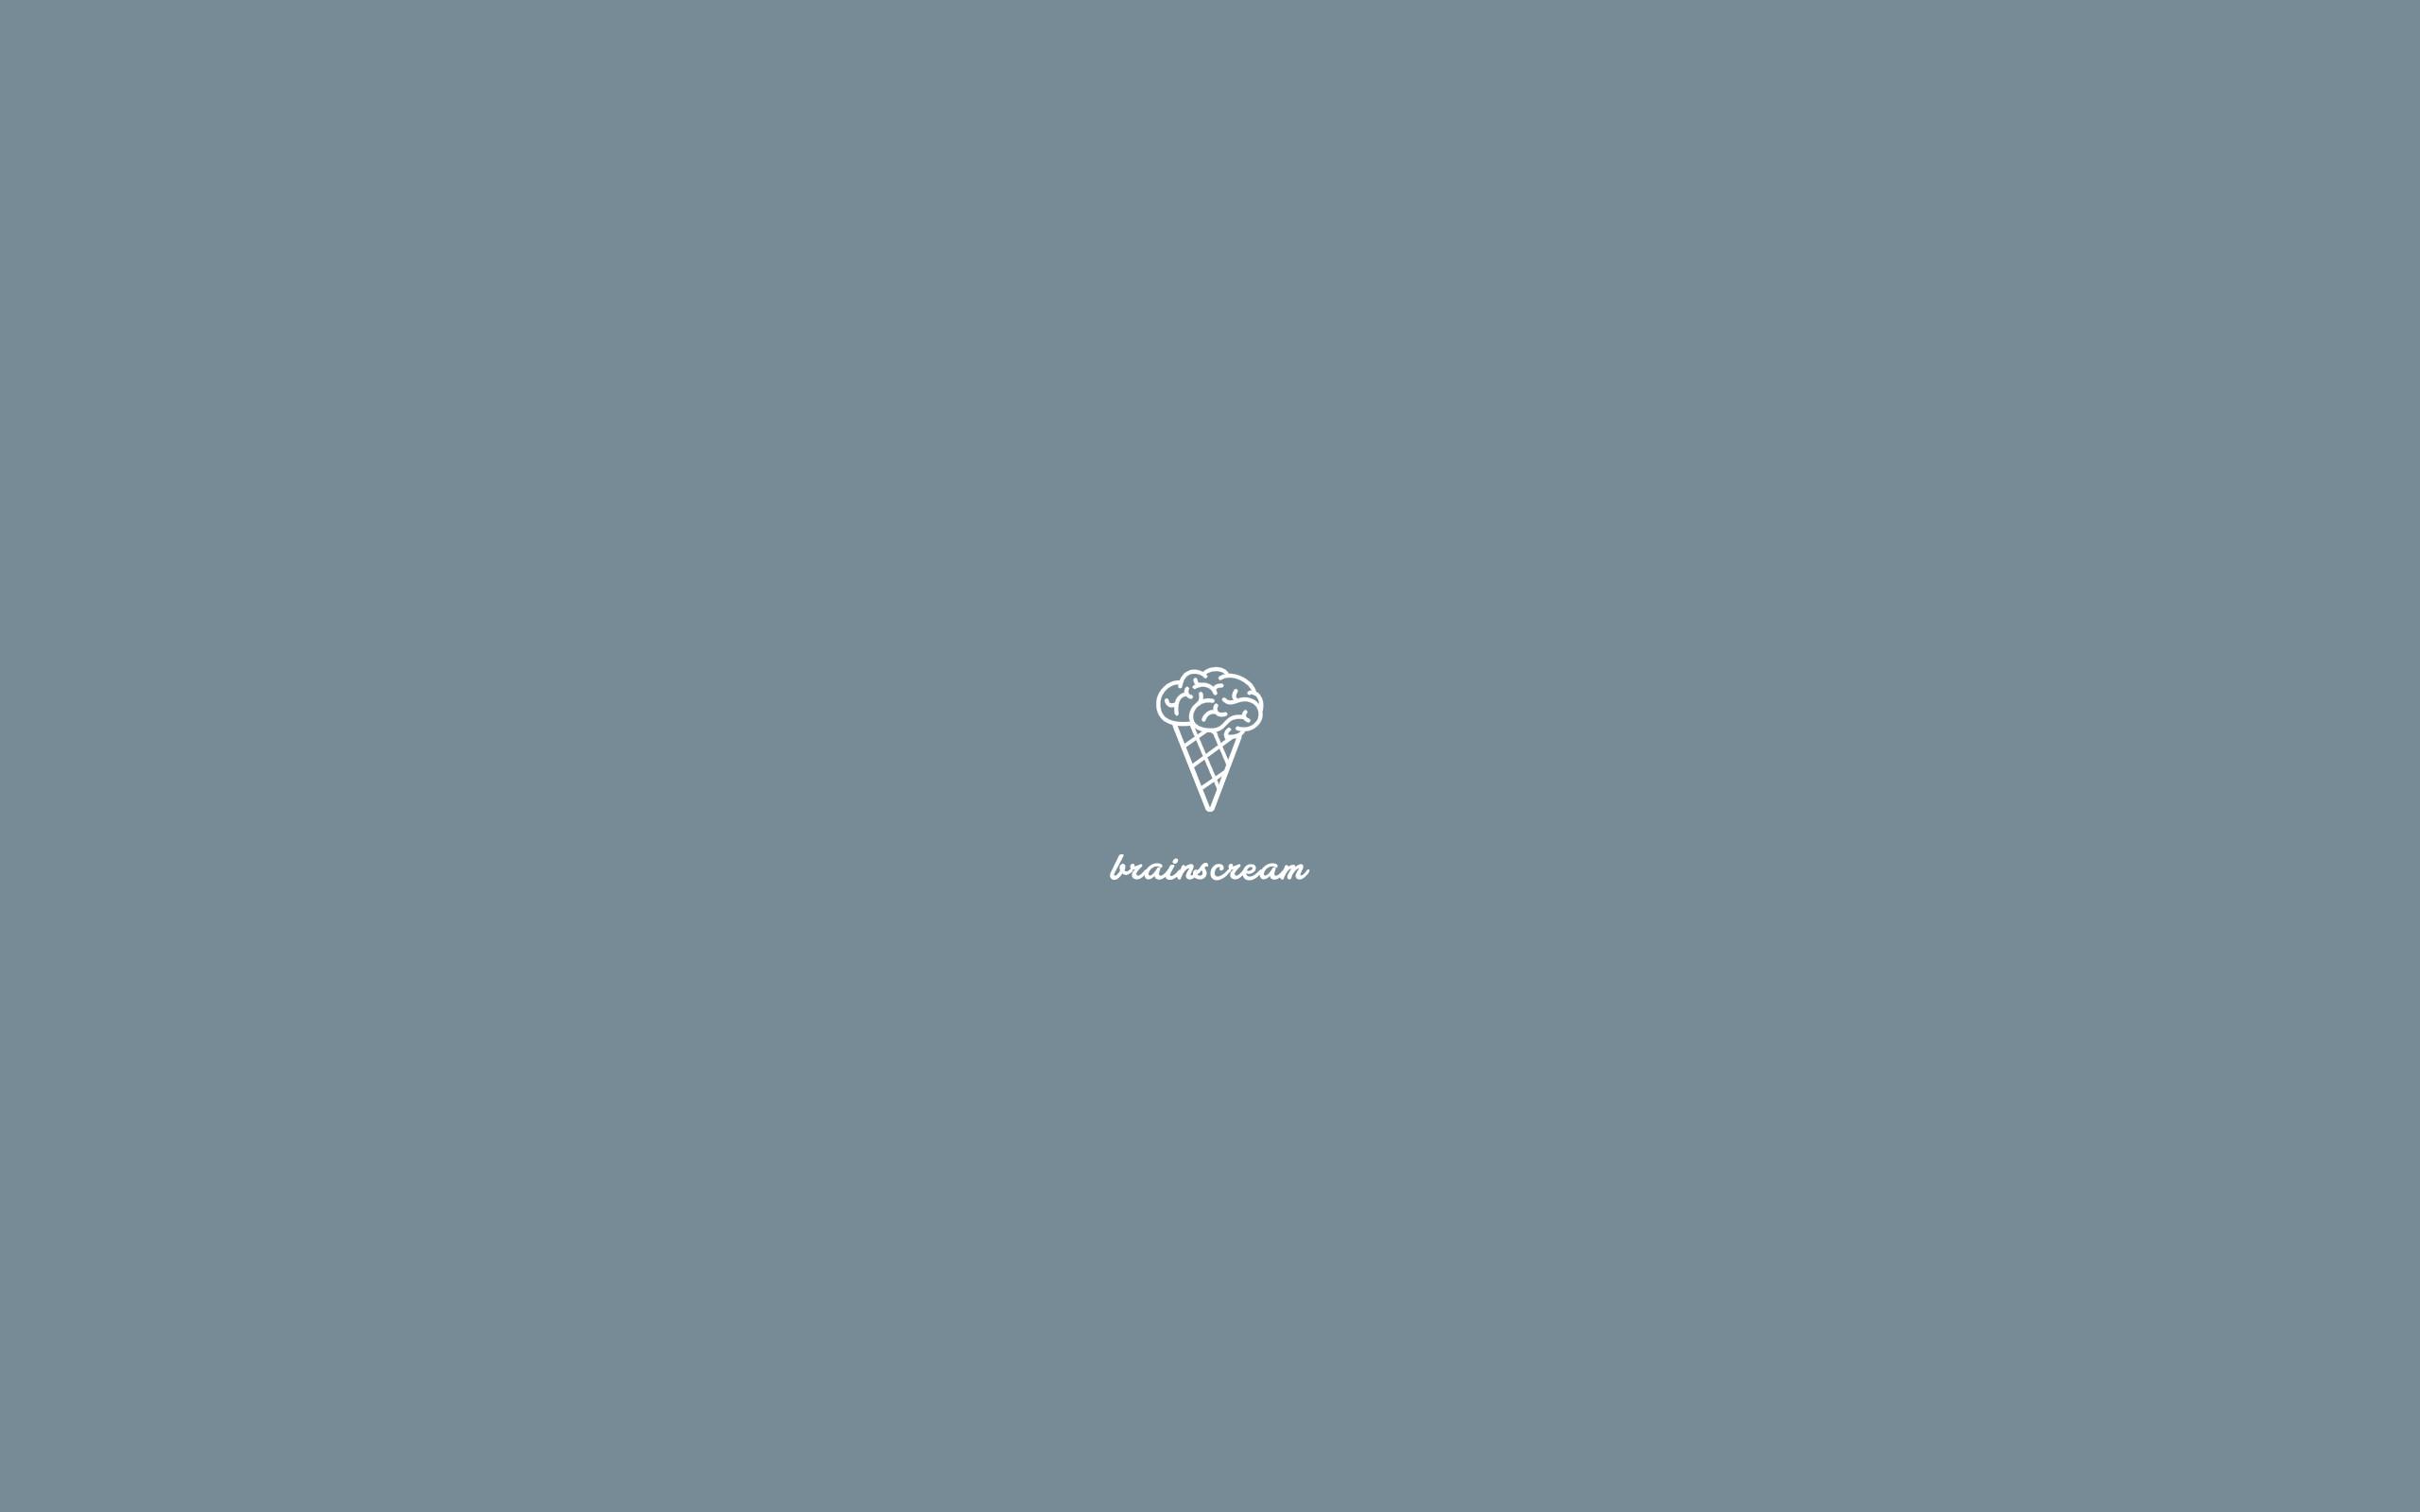 brainscream minimalist wallpaper blue